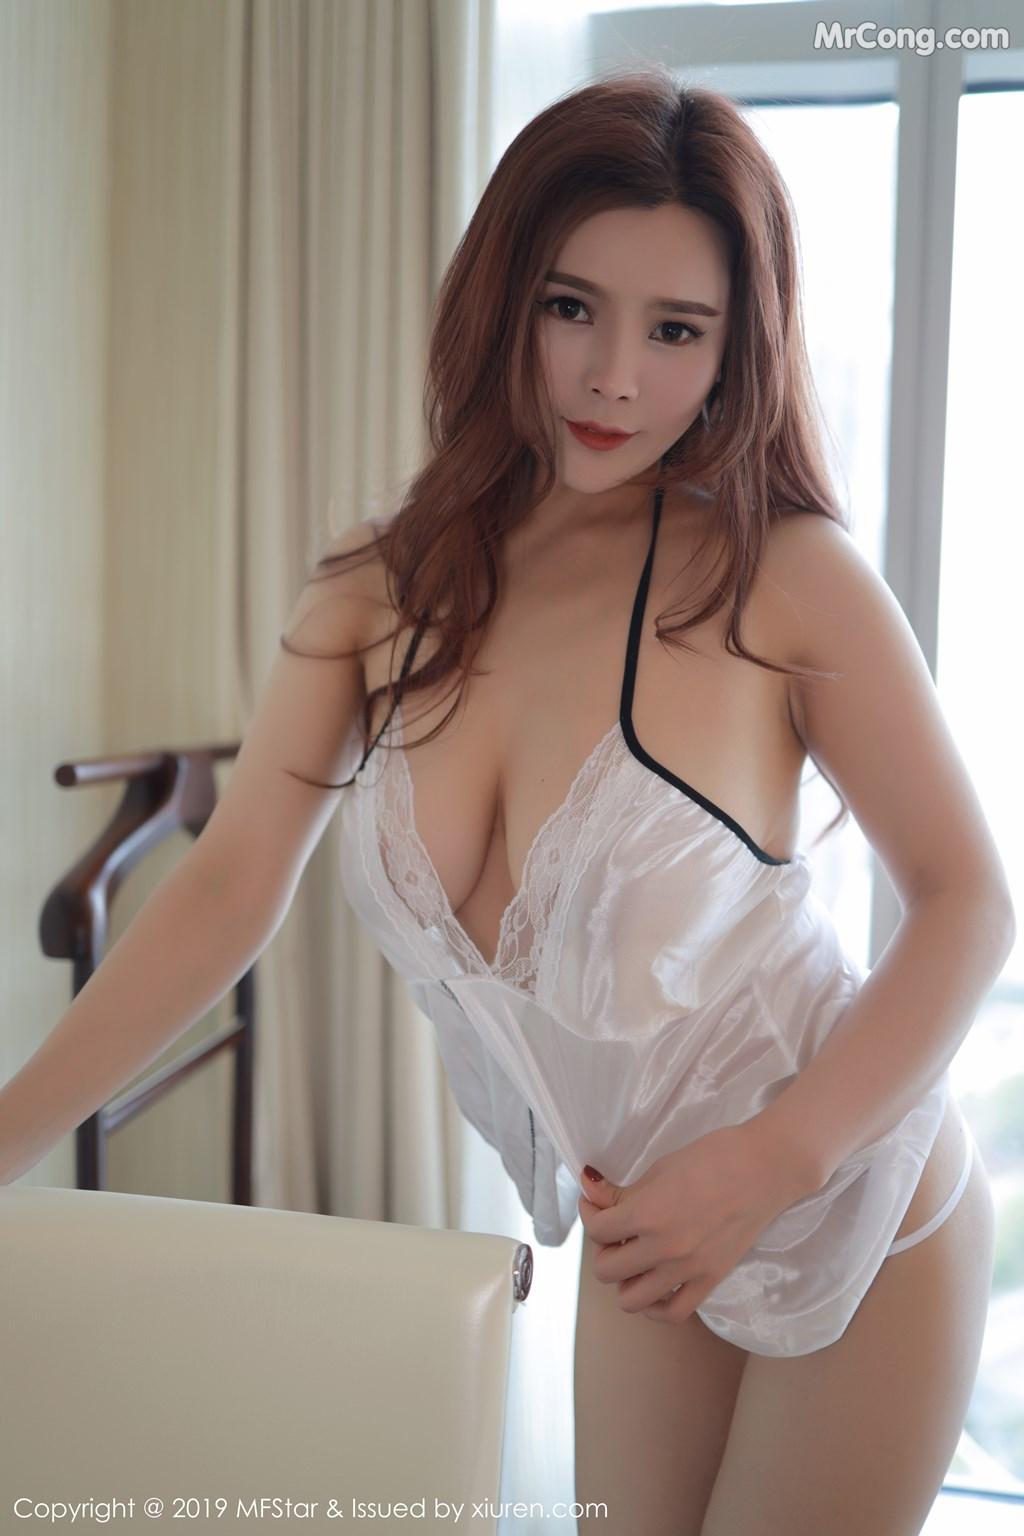 Image MFStar-Vol.185-201712-MrCong.com-007 in post MFStar Vol.185: 胡润曦201712 (41 ảnh)